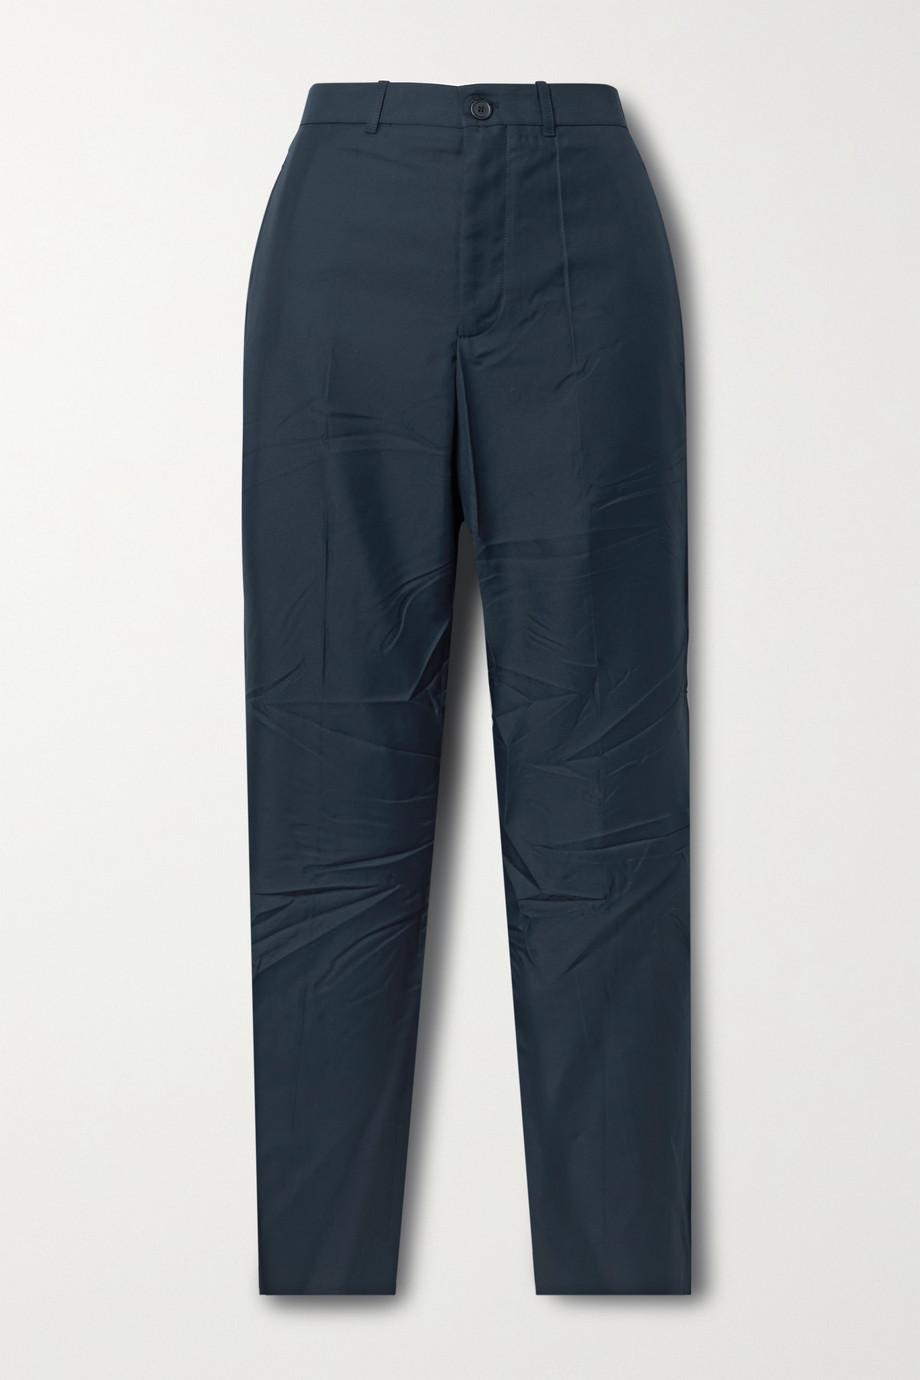 Balenciaga Pantalon slim en serge froissée